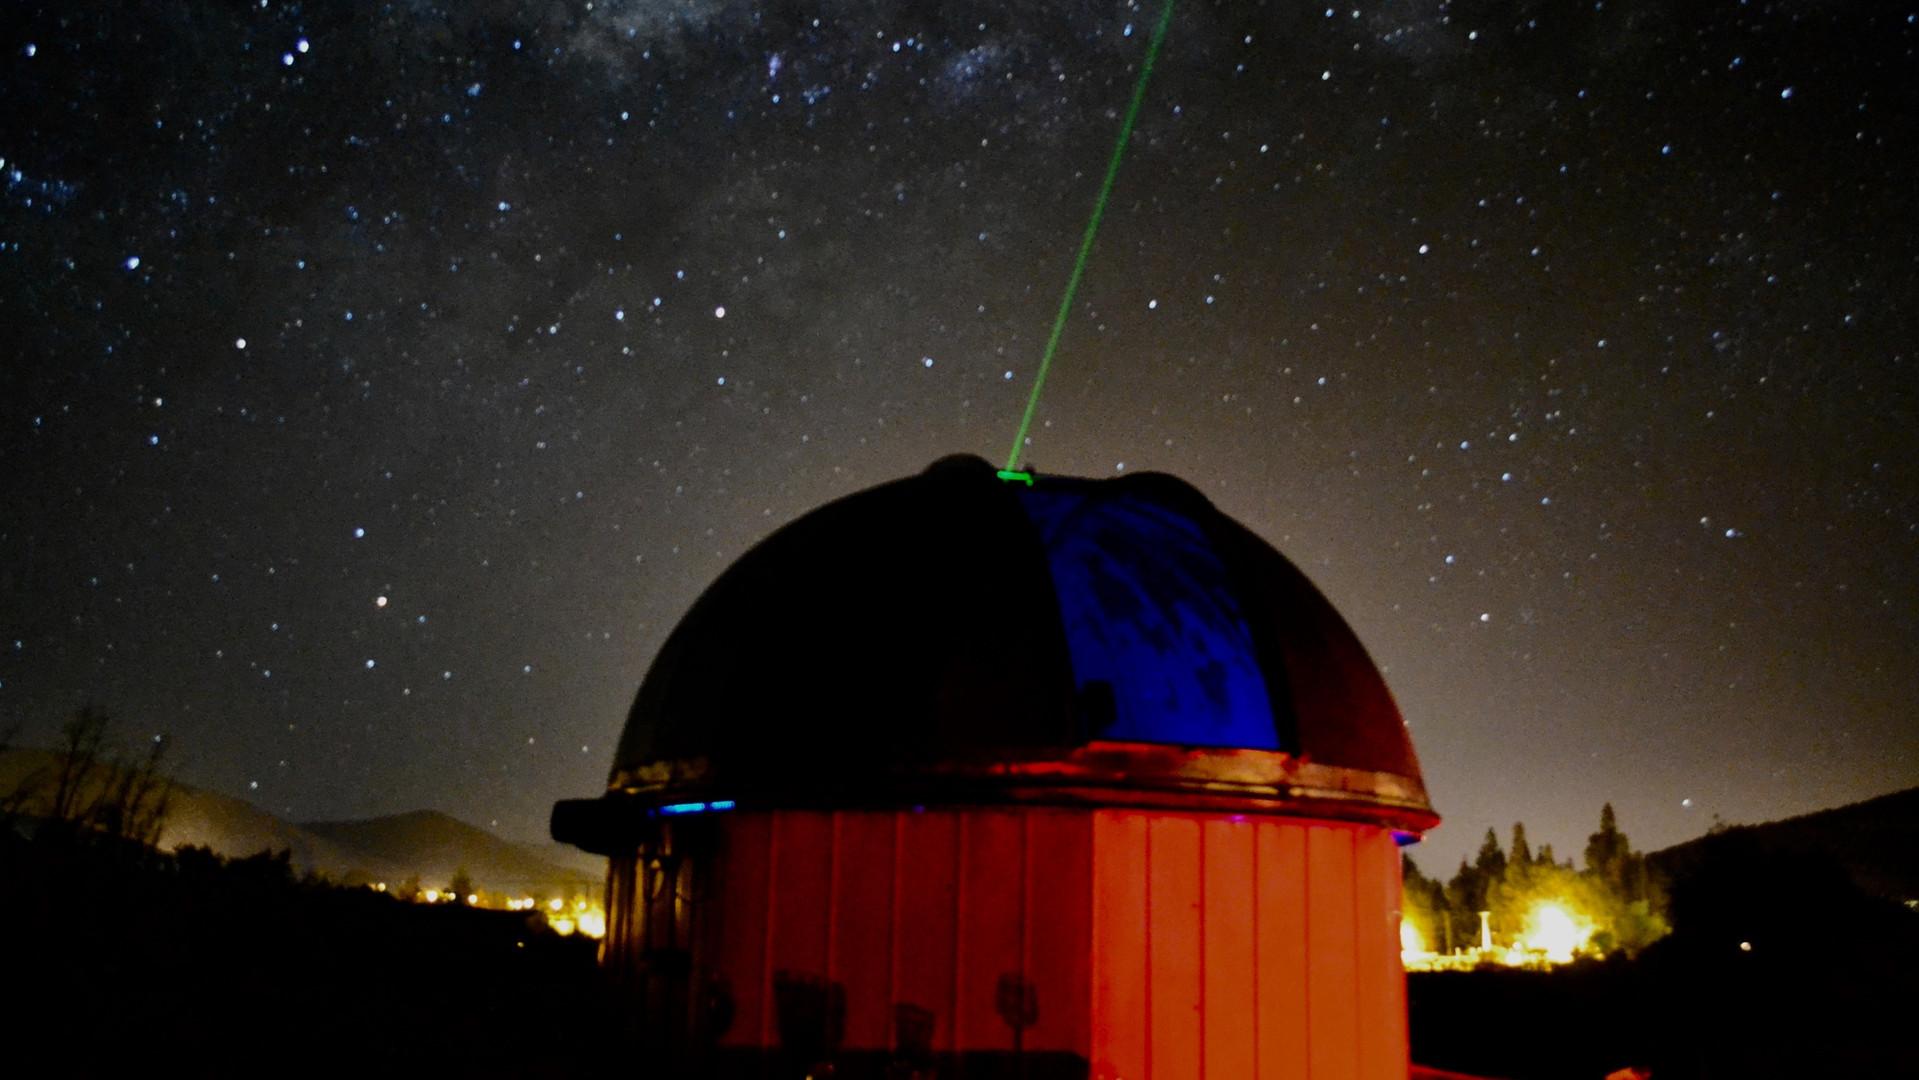 observatorio2 editado.jpg